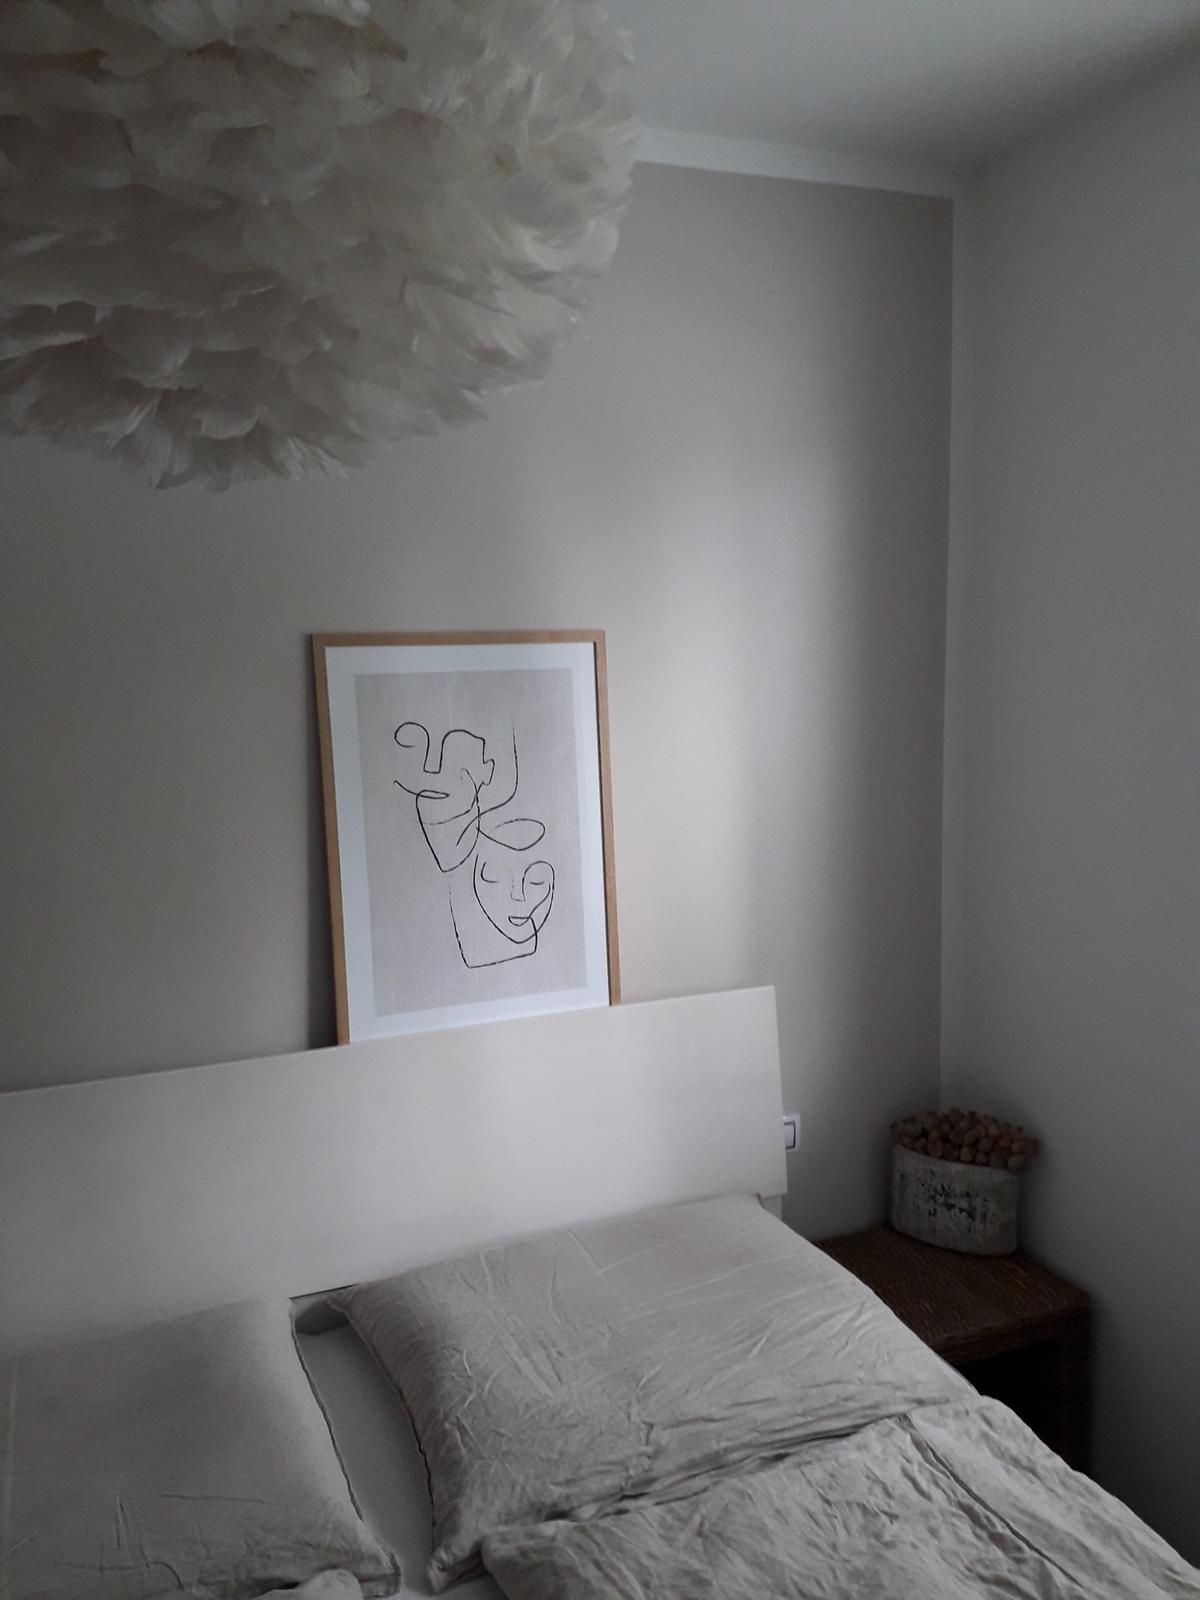 Náš nový domov - Obrázek č. 181